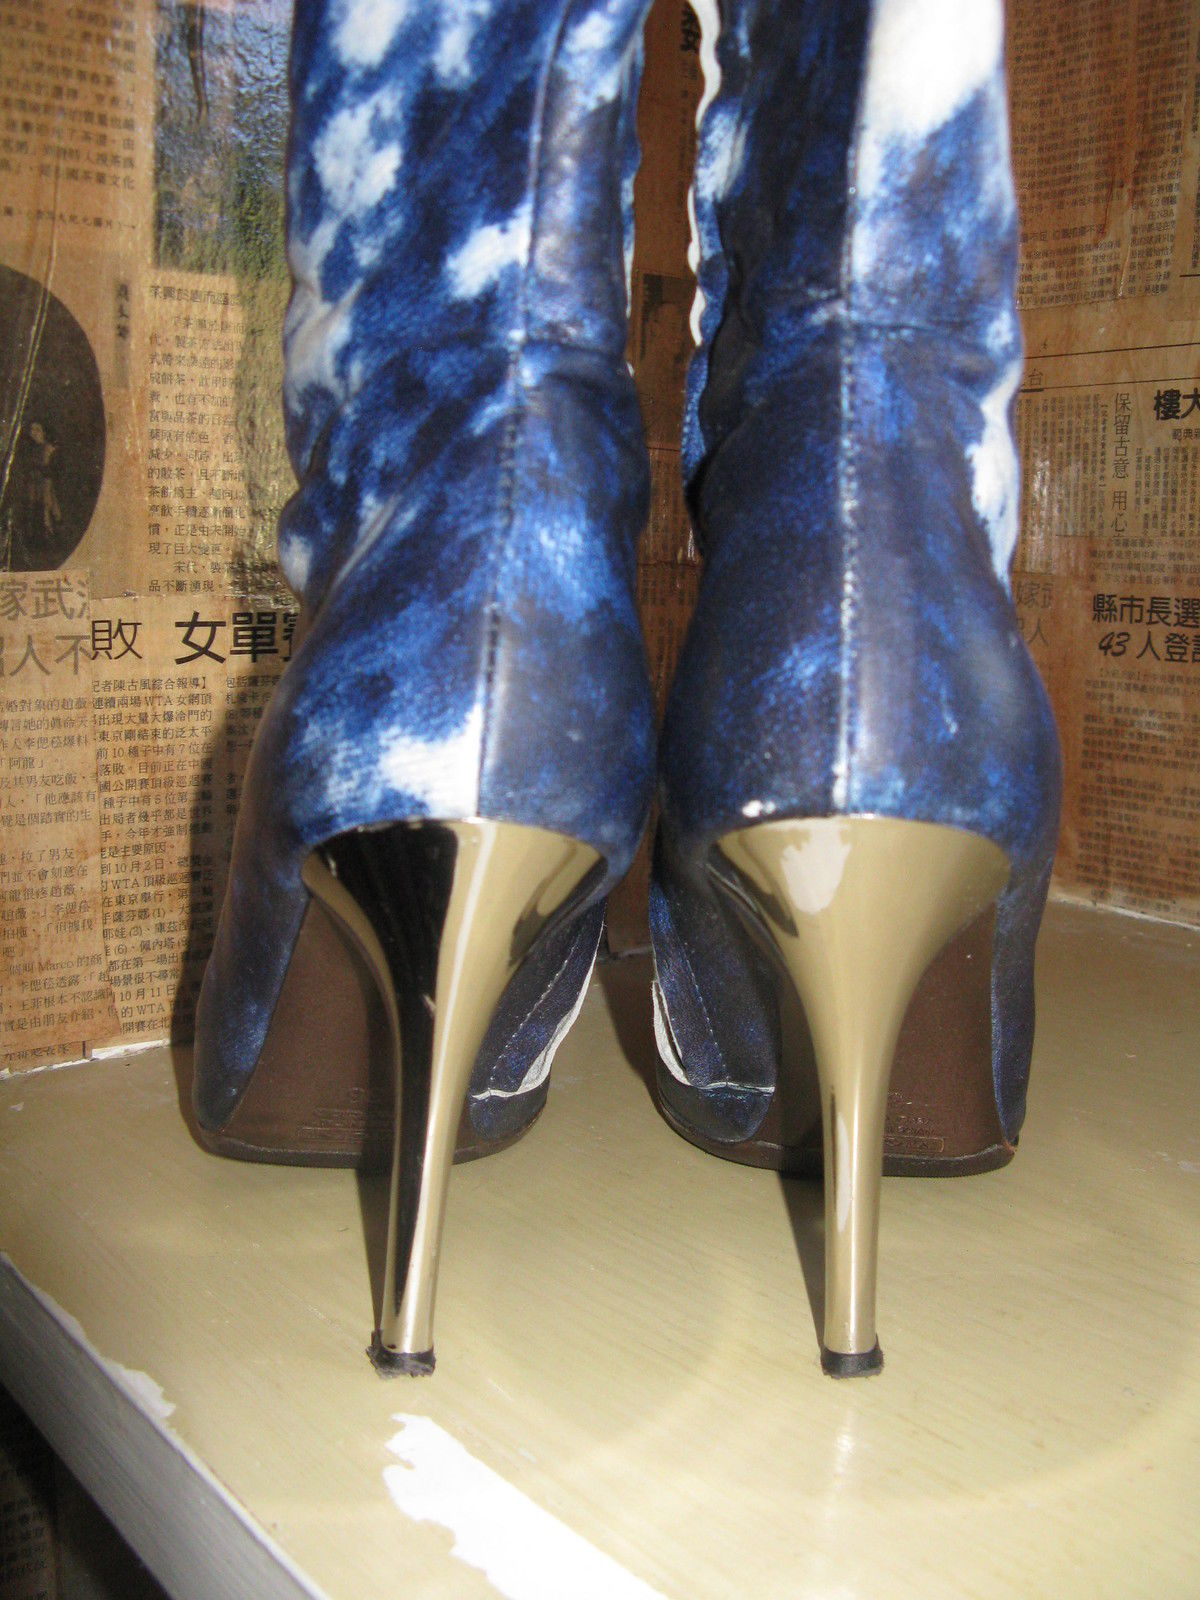 Roberto Cavalli tie dye denim look leather silver chrome heels boots 6 UK3.5 36